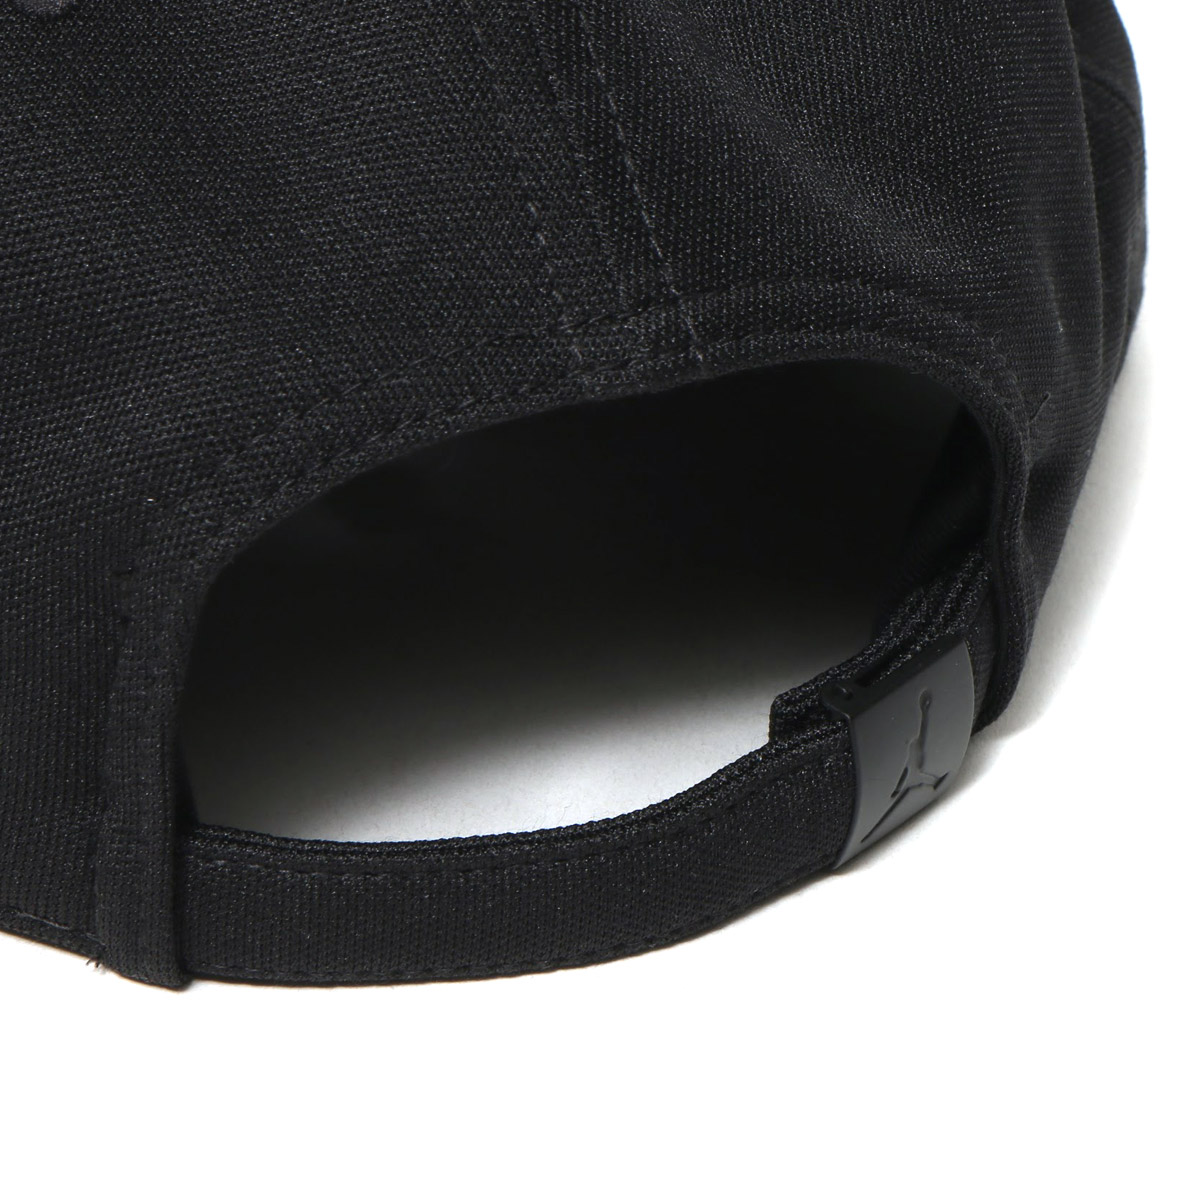 56330b1ad45 NIKE JORDAN WINGS STRAPBACK (Jordan WINGS strap back cap) BLACK WHITE 17FA-I